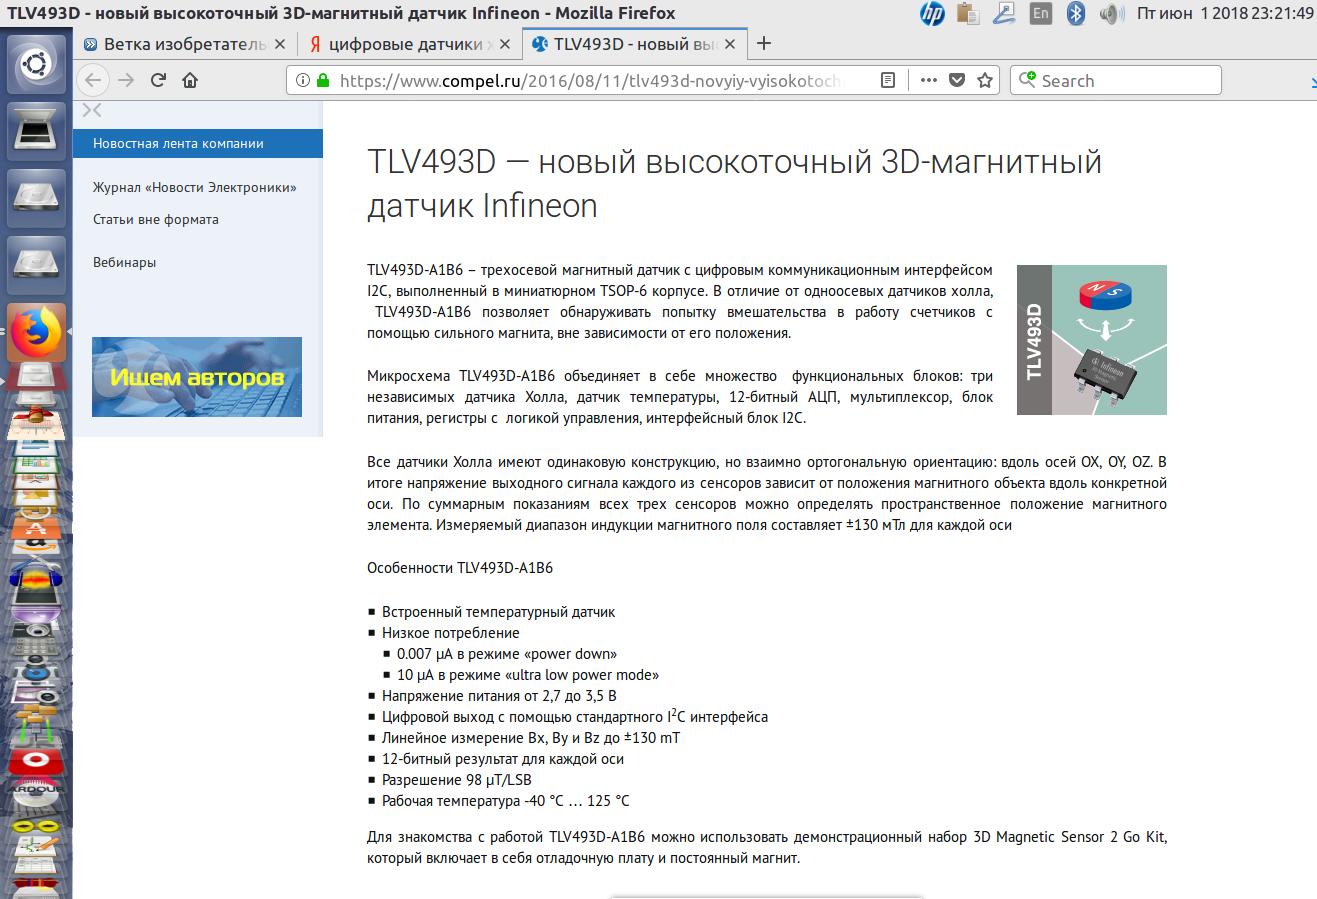 http://i5.imageban.ru/out/2018/06/01/f650e52c30f82c9604902b6037ac8aee.png